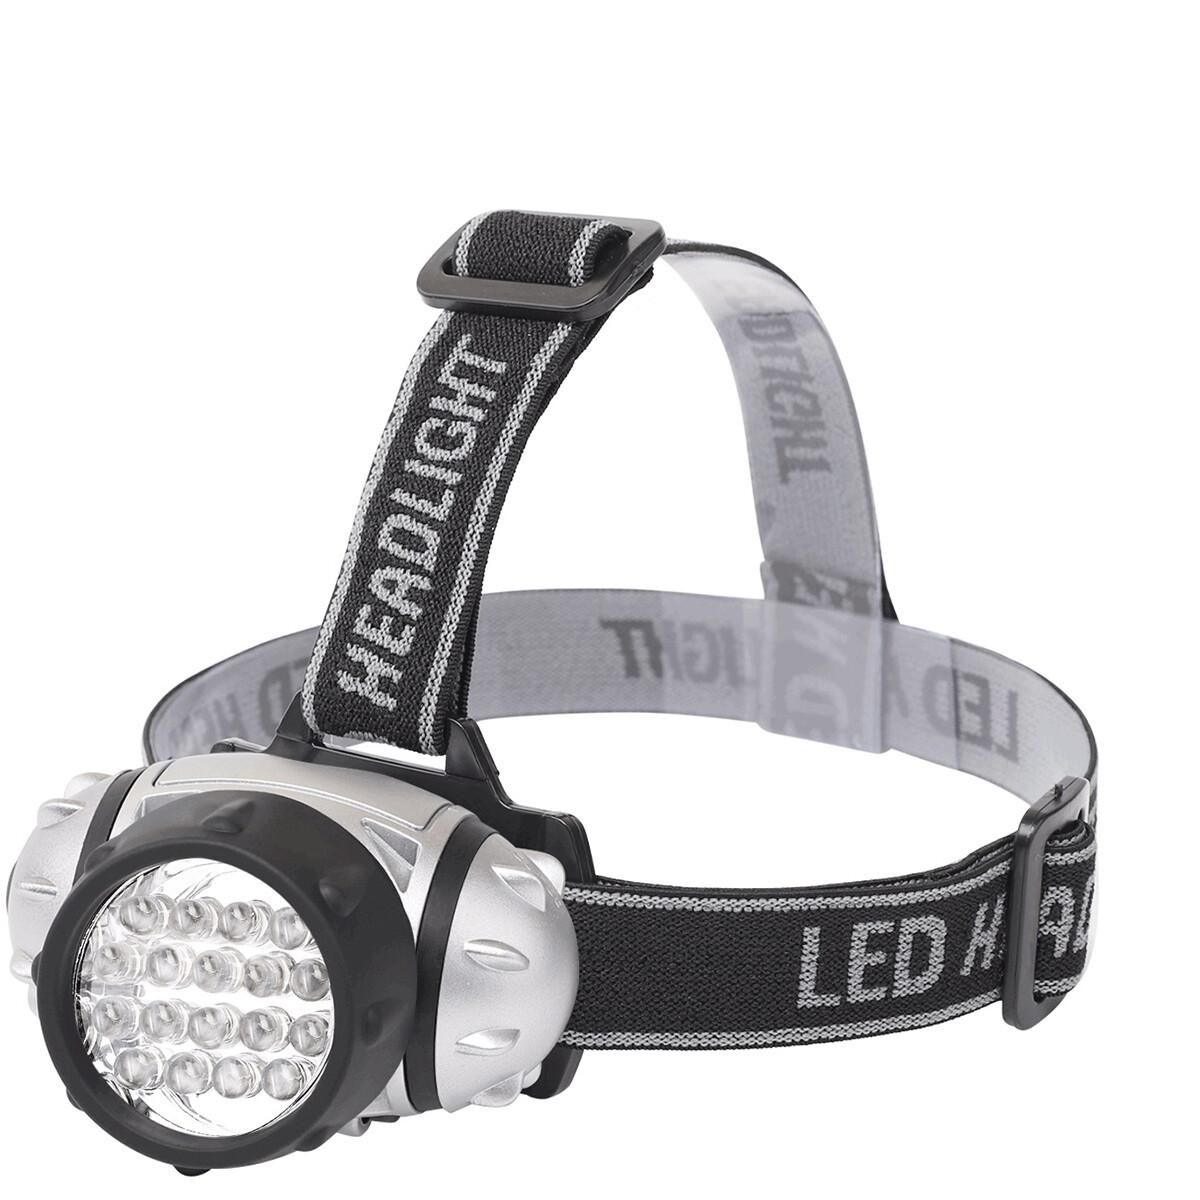 LED Hoofdlamp - Aigi Heady - Waterdicht - 35 Meter - Kantelbaar - 18 LED's - 1.1W - Zilver | Vervang